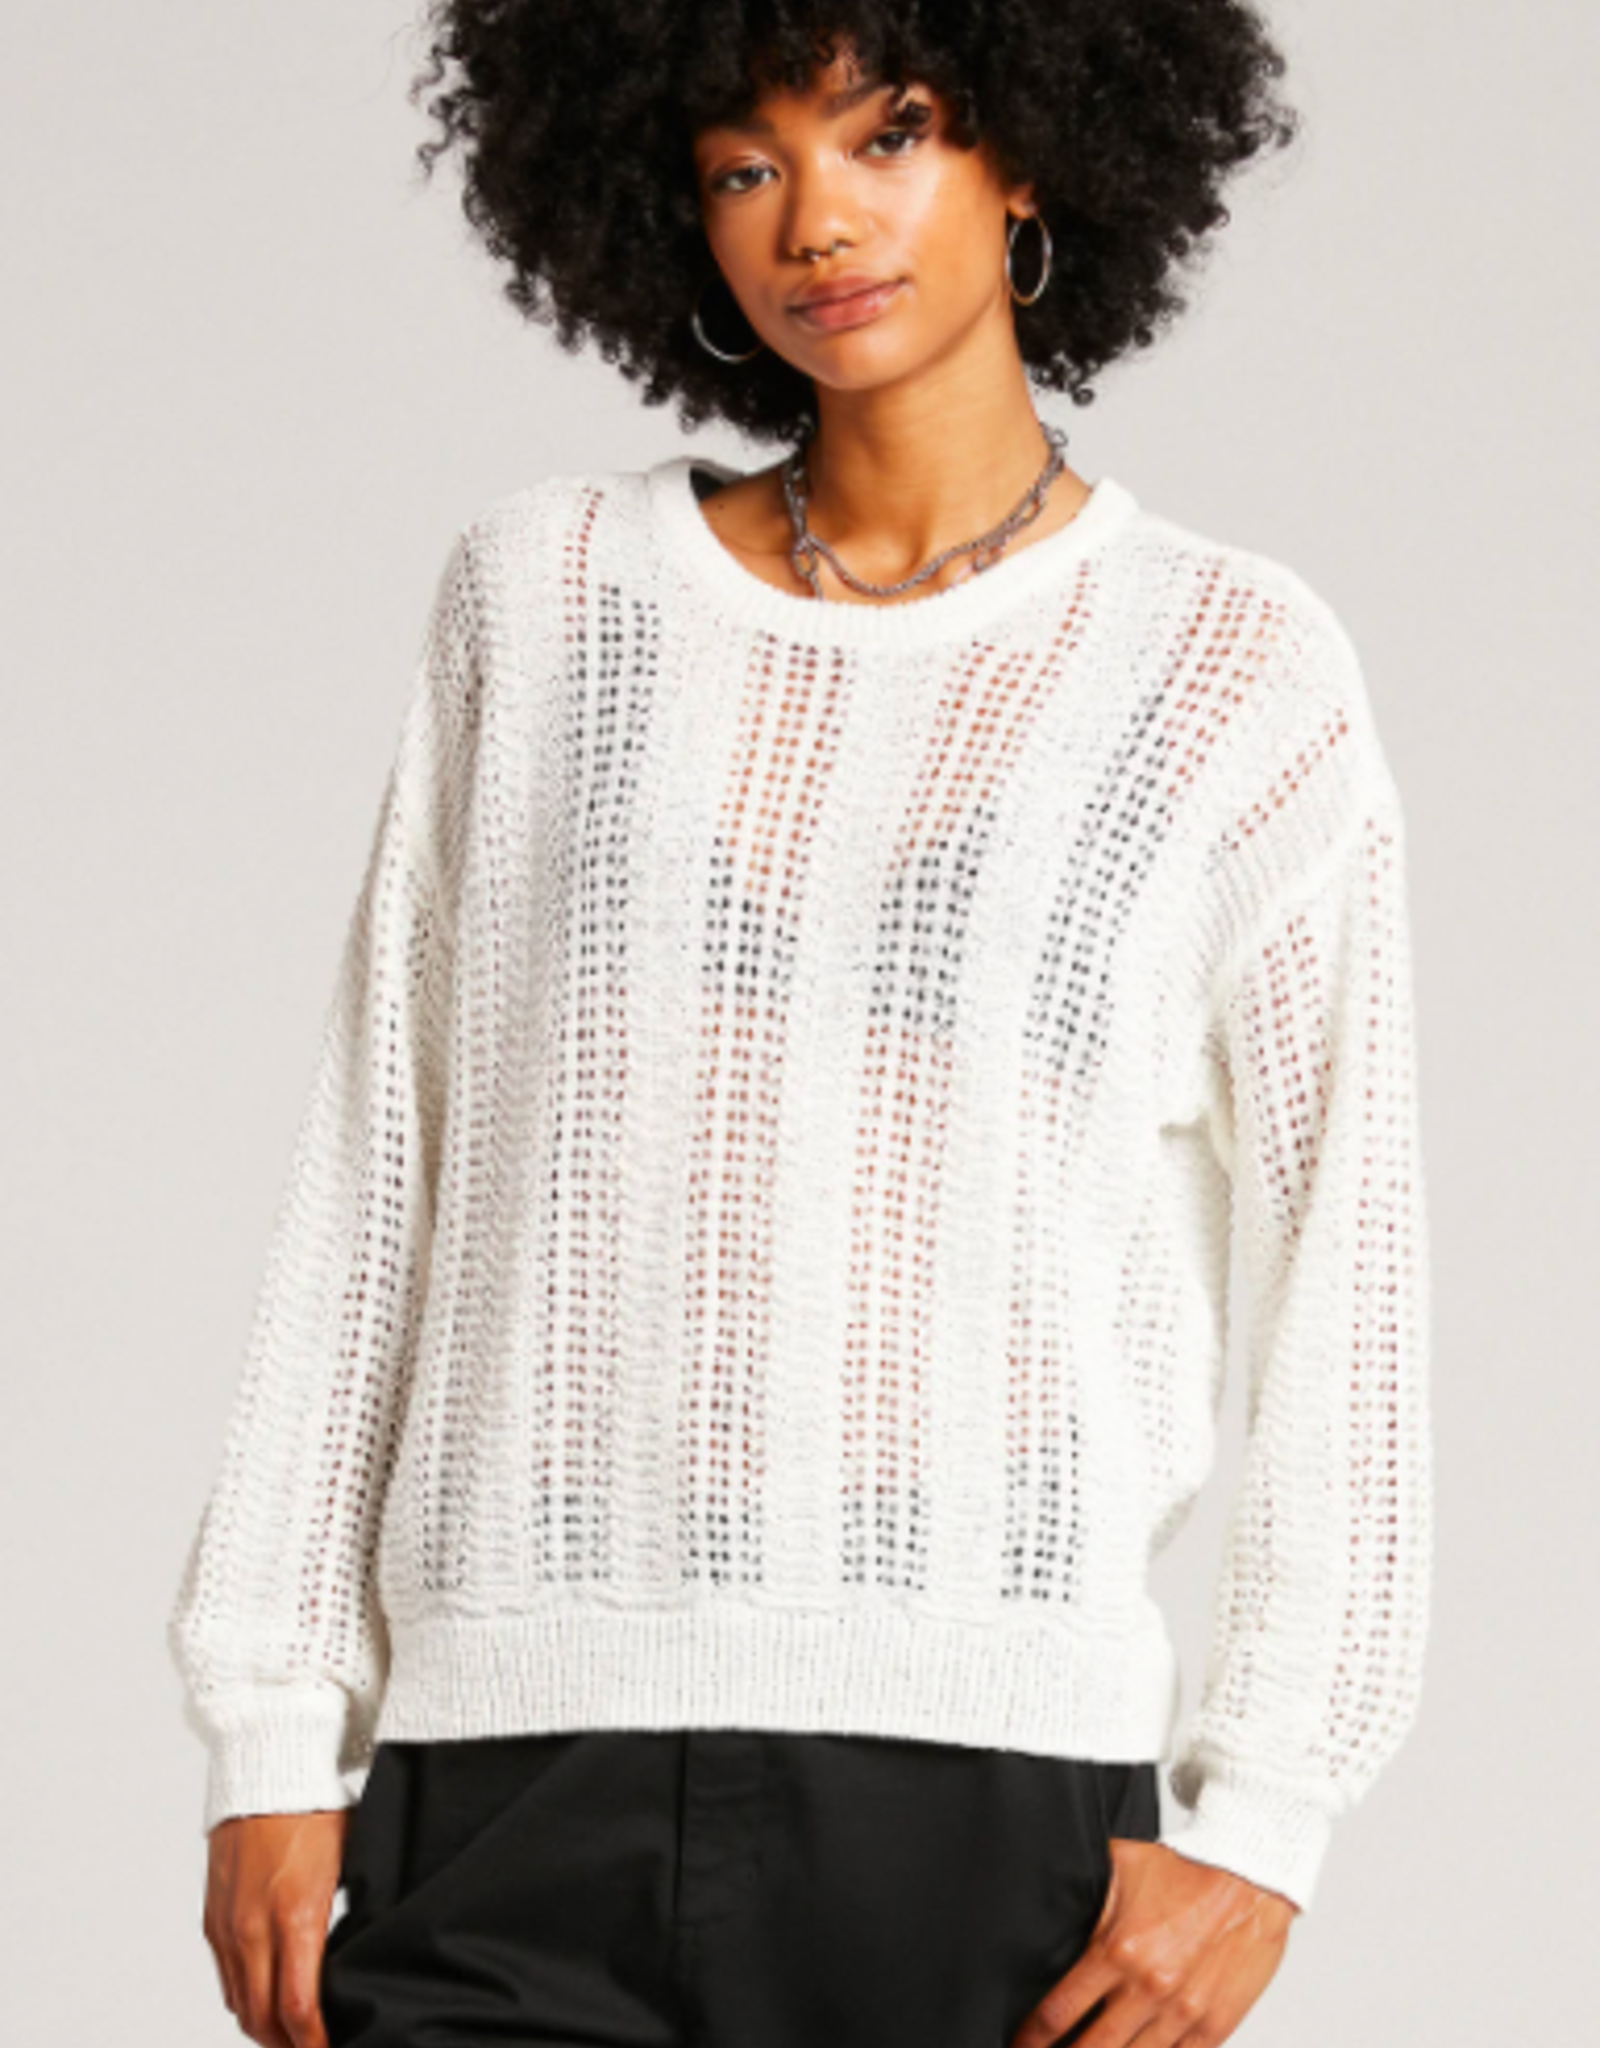 Volcom Women's LIL Sweater